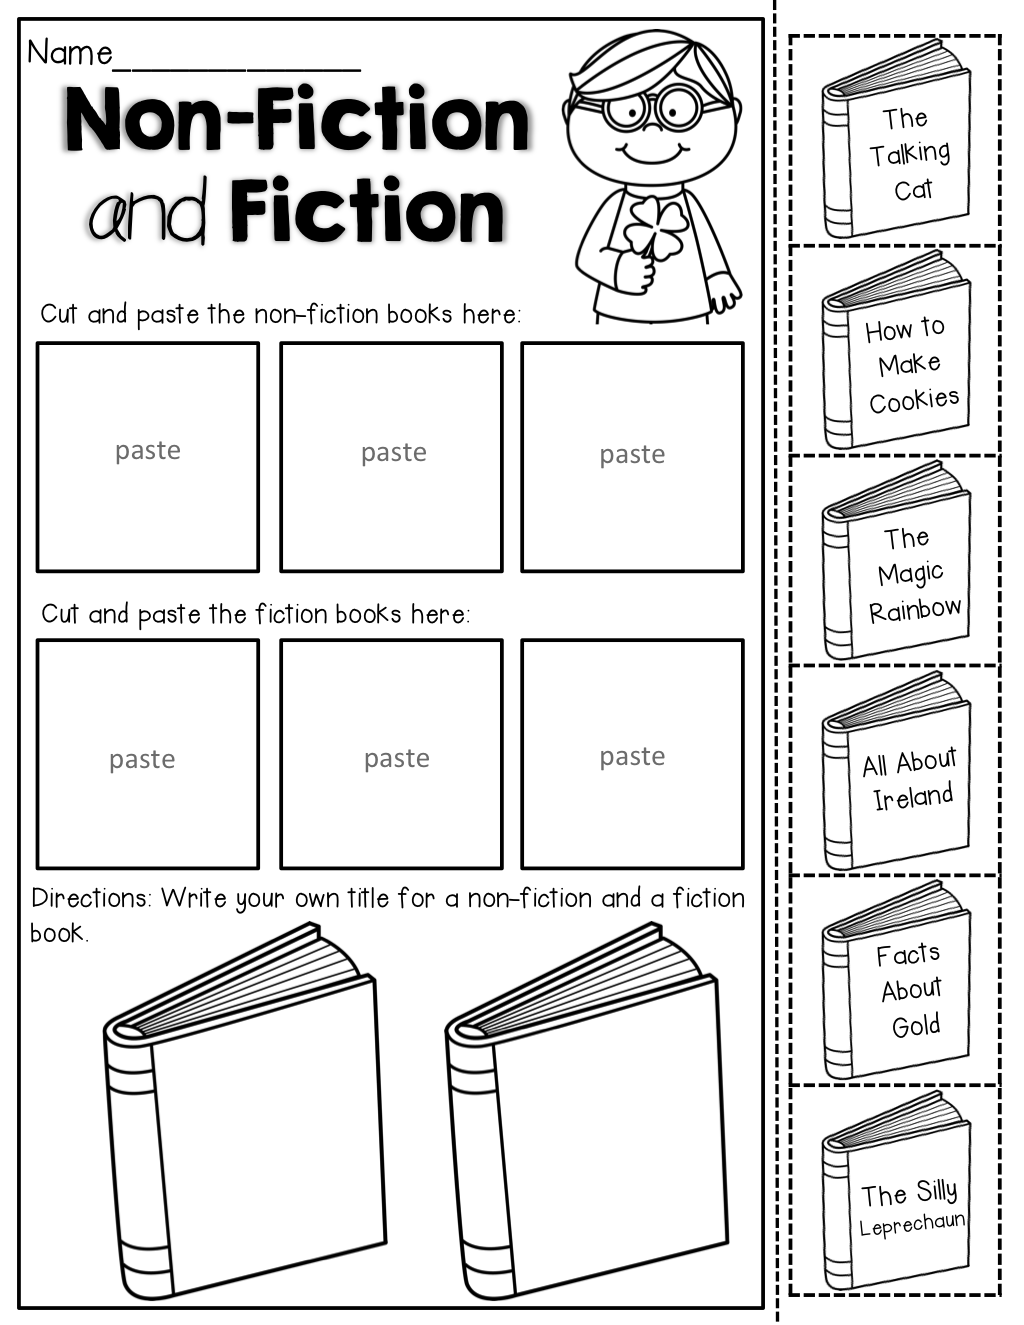 medium resolution of https://dubaikhalifas.com/class-visit-worksheet-fiction-vs-non-fiction/